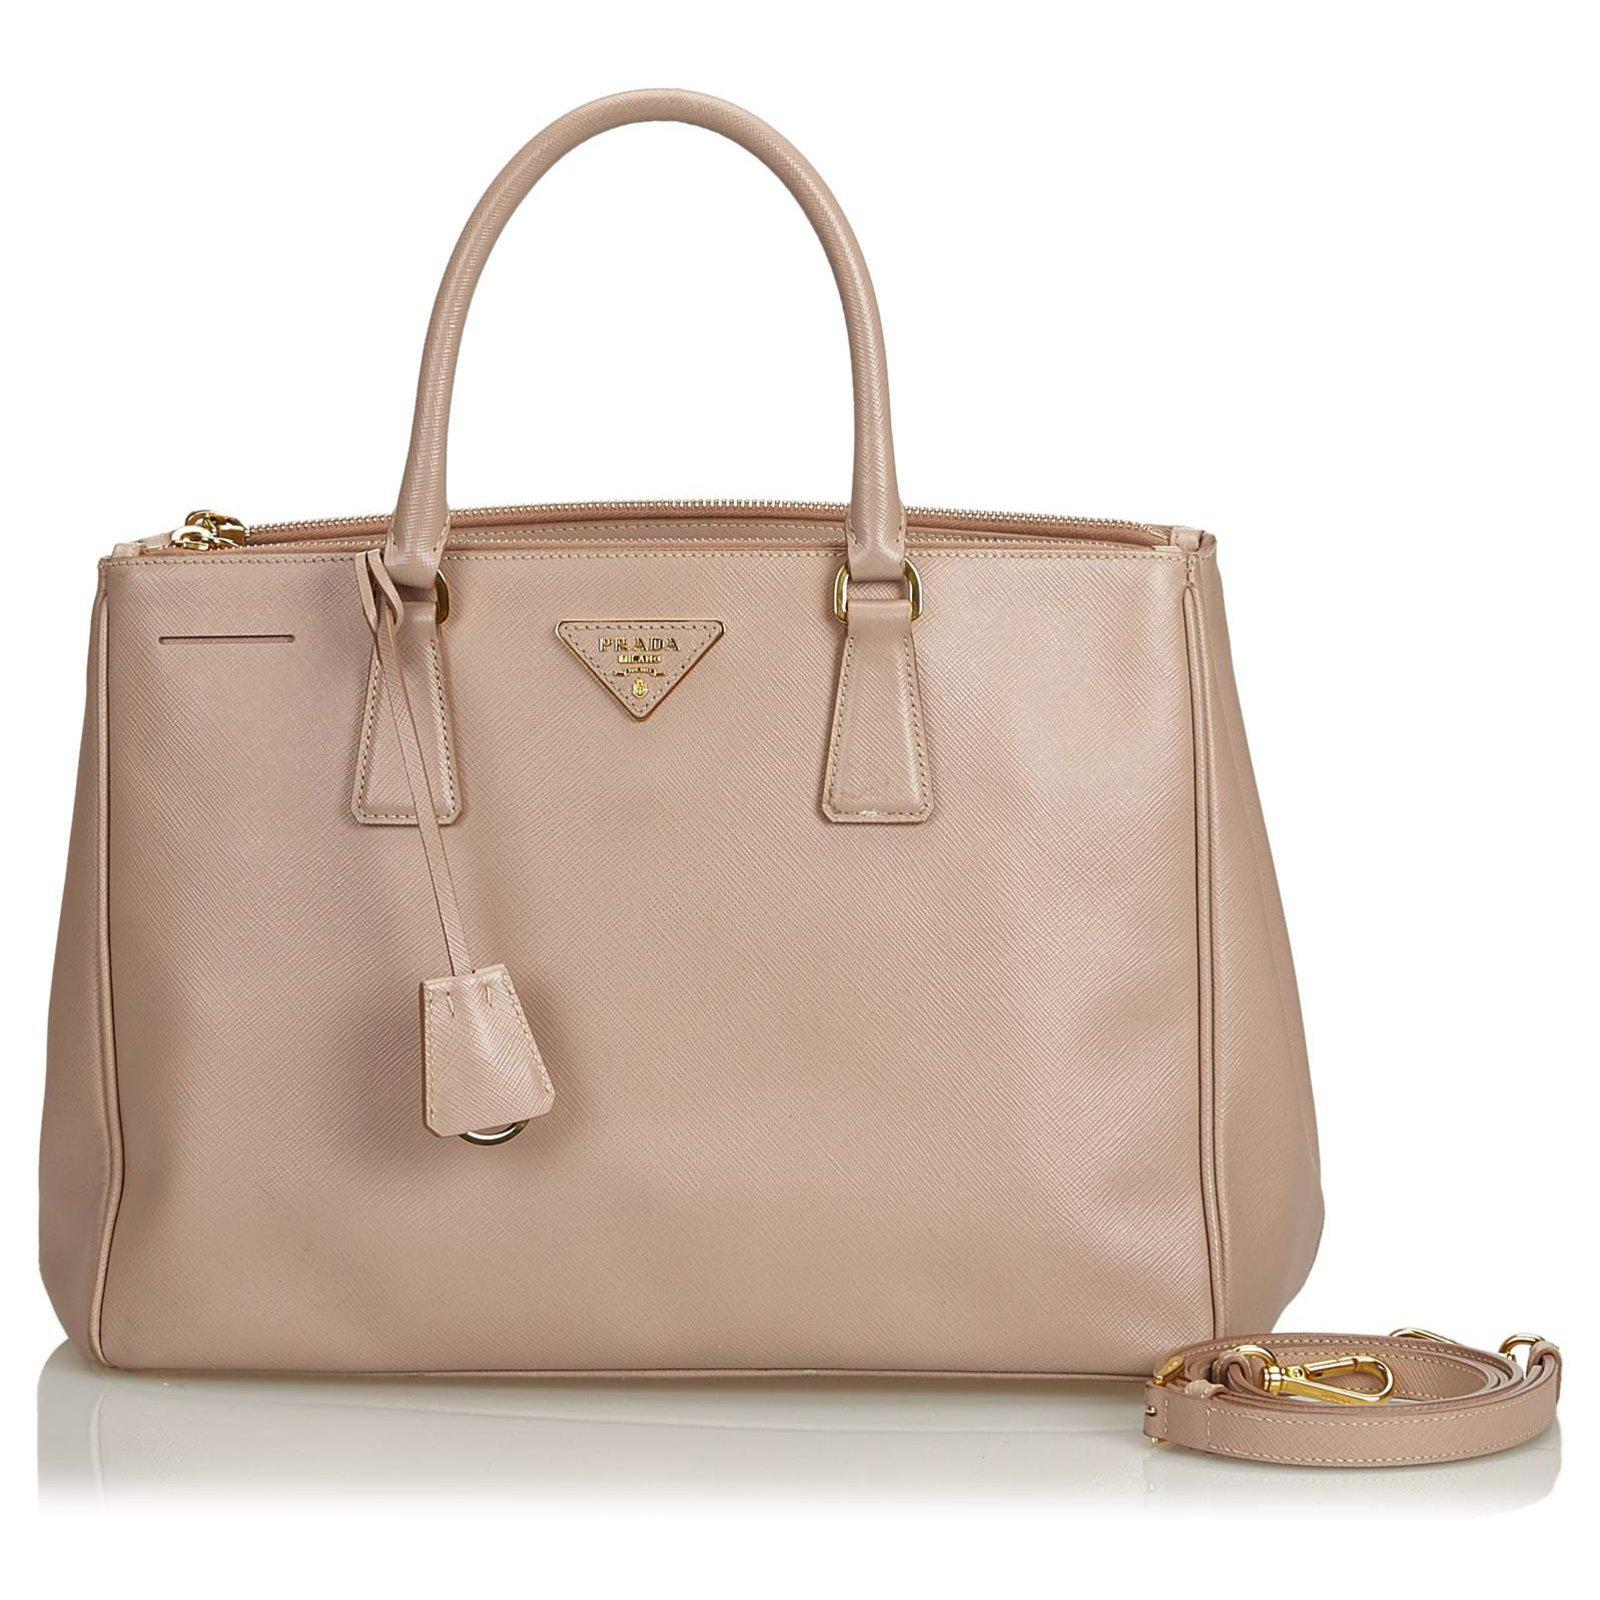 6ef6c4ed58b1 Prada Prada Brown Saffiano Lux lined Zip Galleria Satchel Handbags  Leather